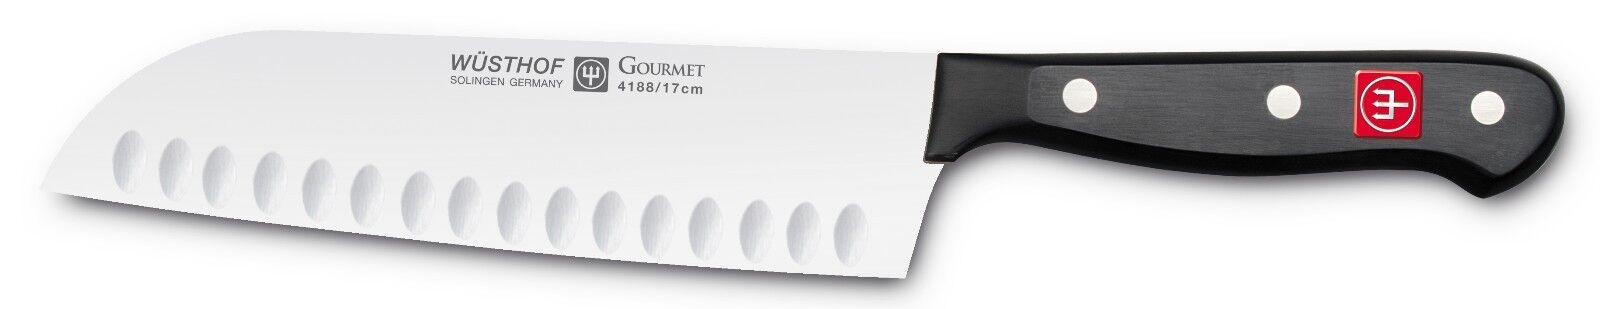 Wusthof Gourmet Santuko Knife, 7